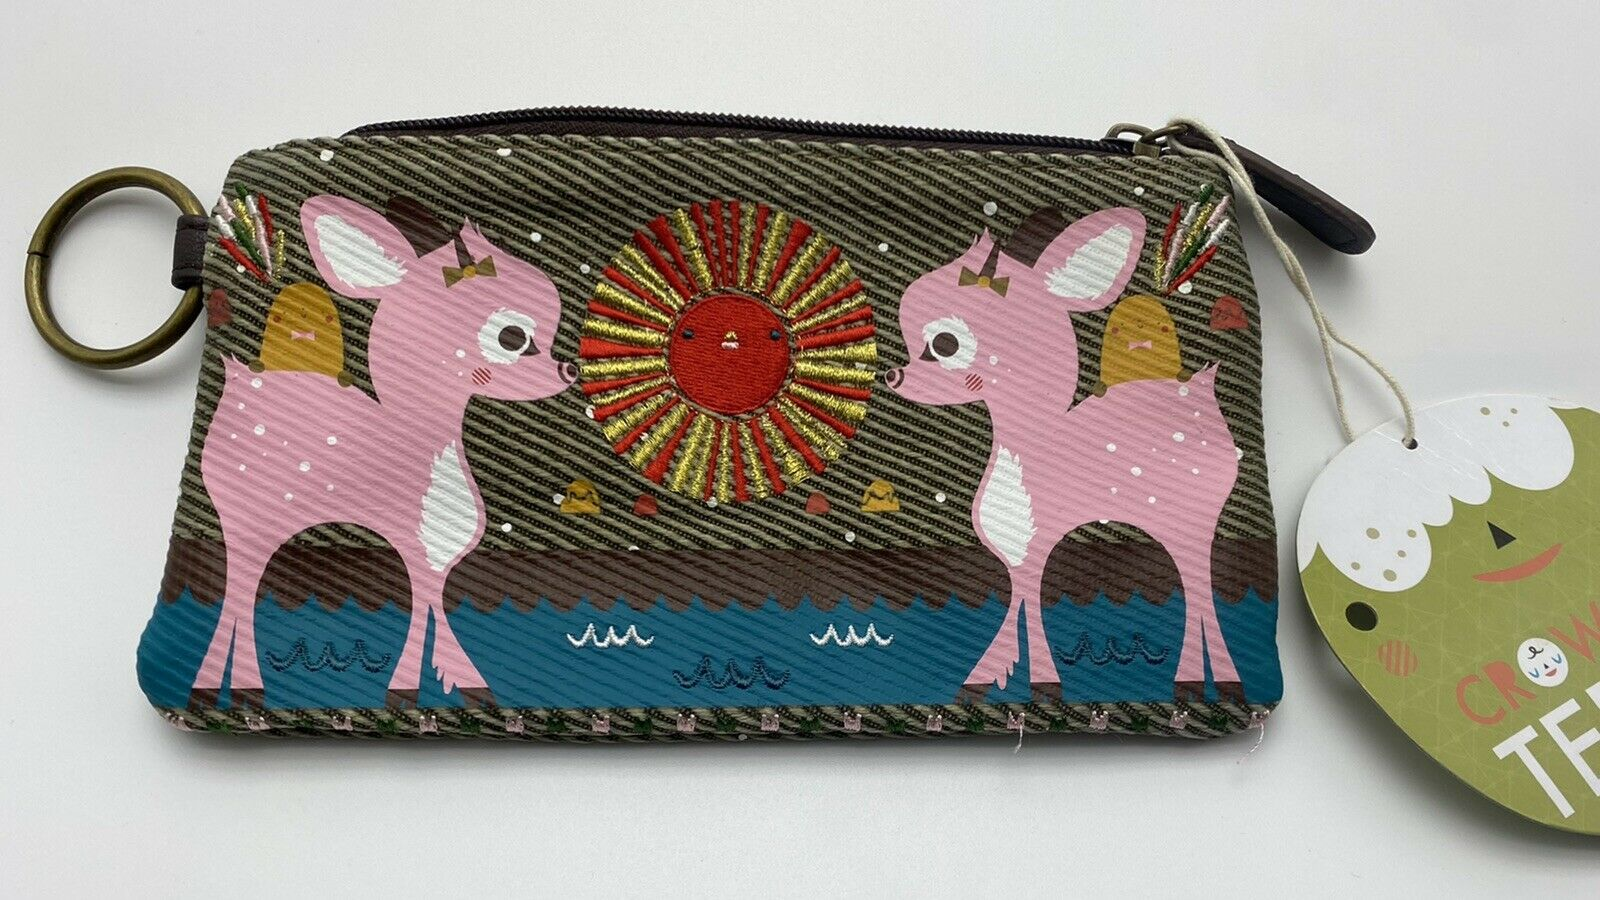 Crowded Teeth Zipper Wallet Pink Deer Sun Coin Purse Bag Clutch Pouch Loungefly